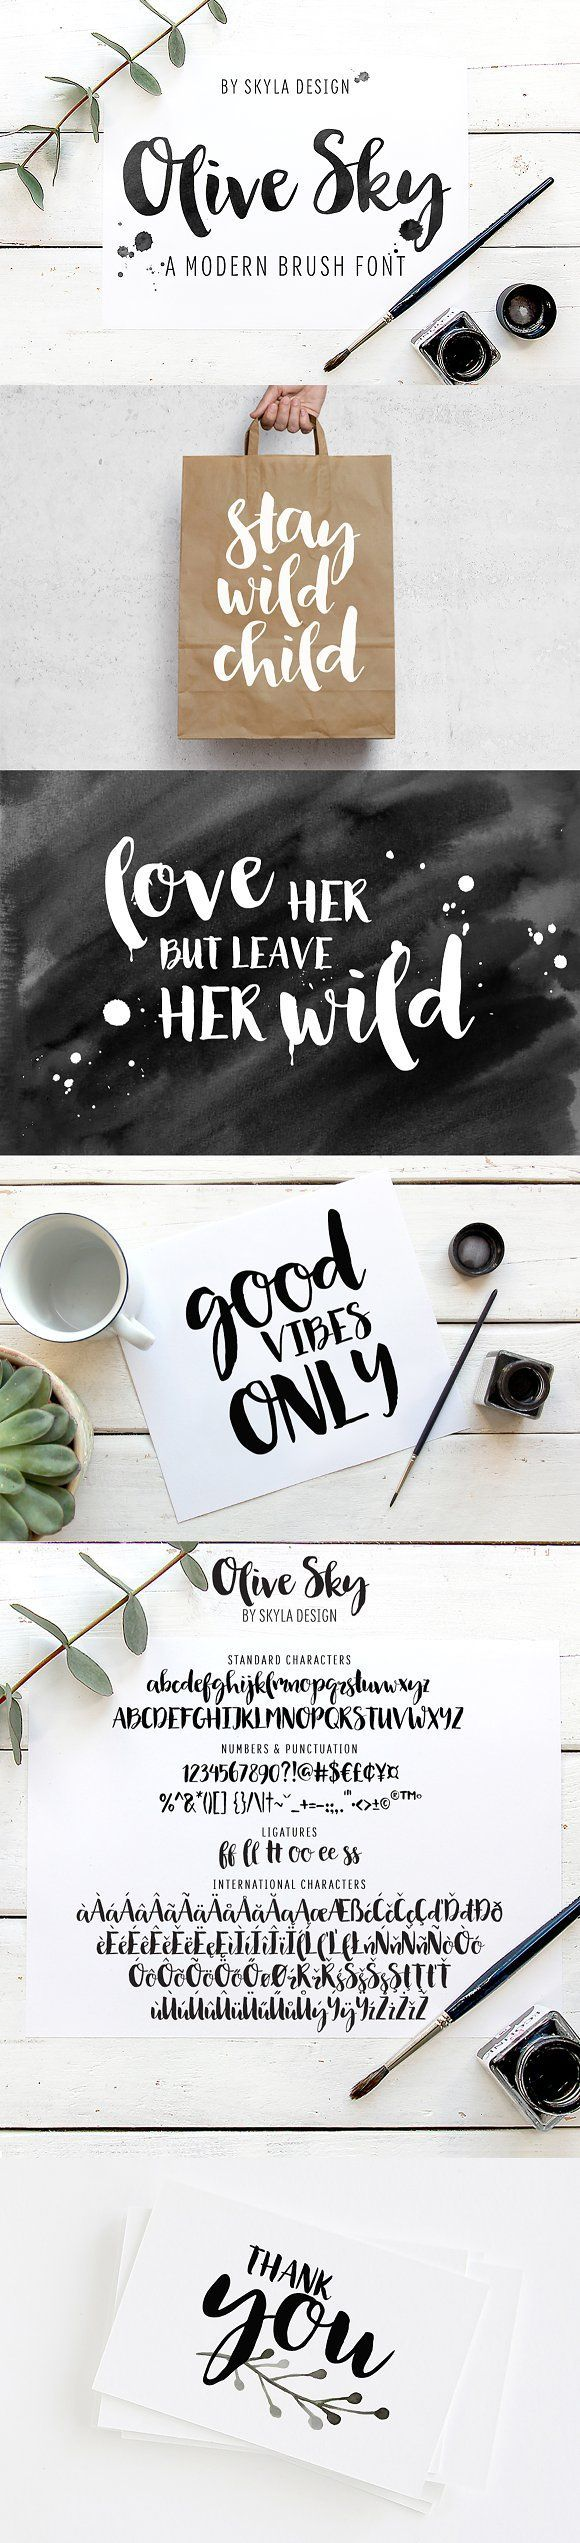 Modern brush font - Olive Sky  by Skyla Design on @creativemarket